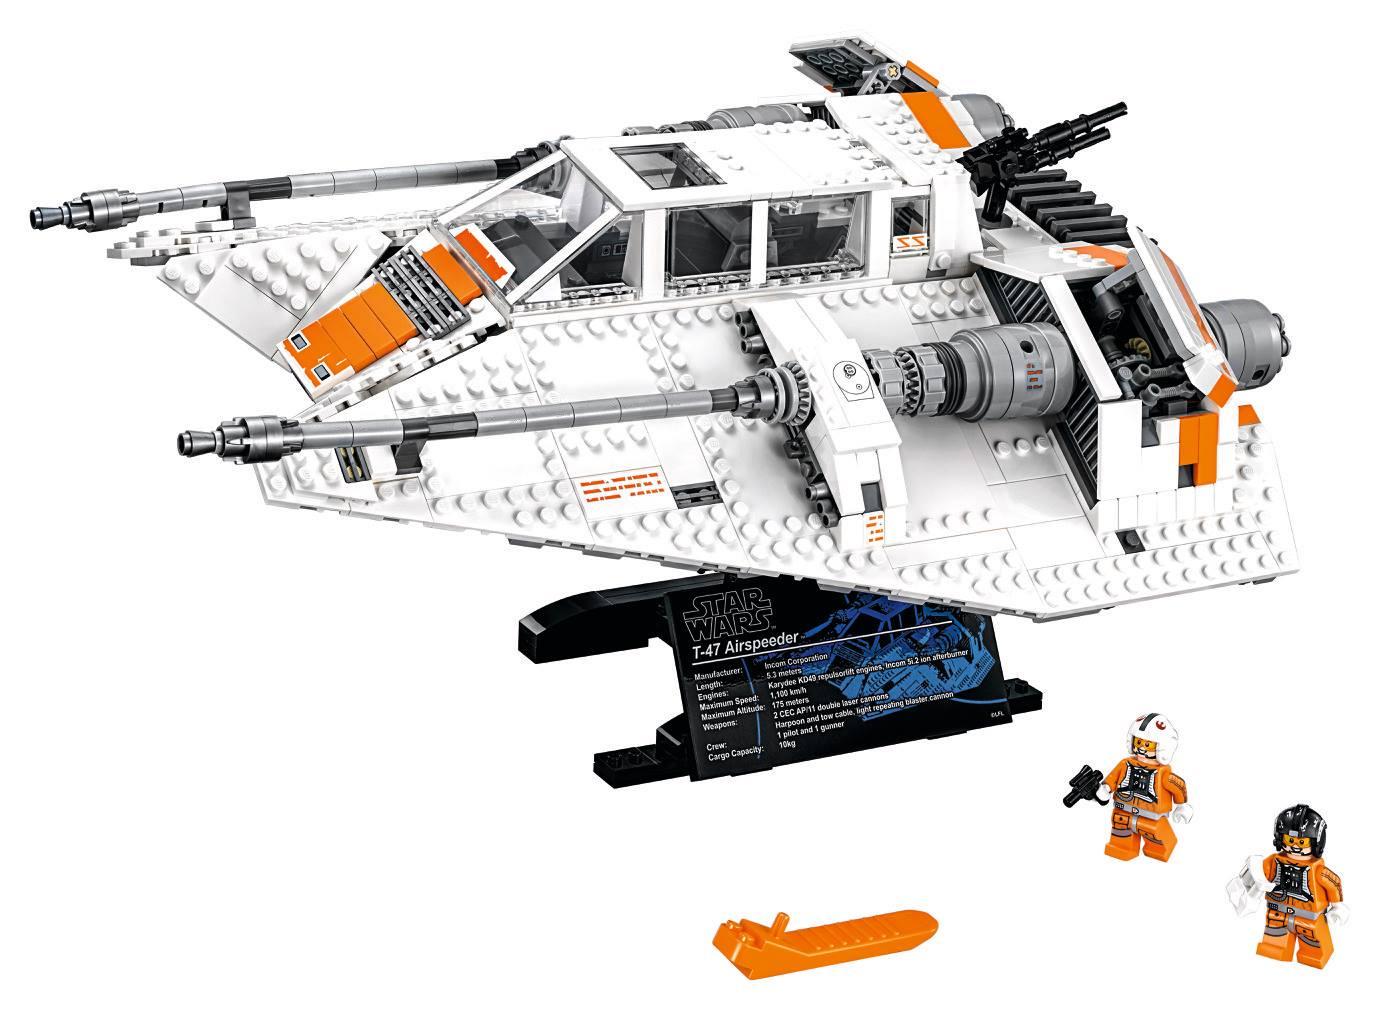 Lego Star Wars Snowspeeder 75144 Back In Stock On Shop Toy 75098 Assault Hoth